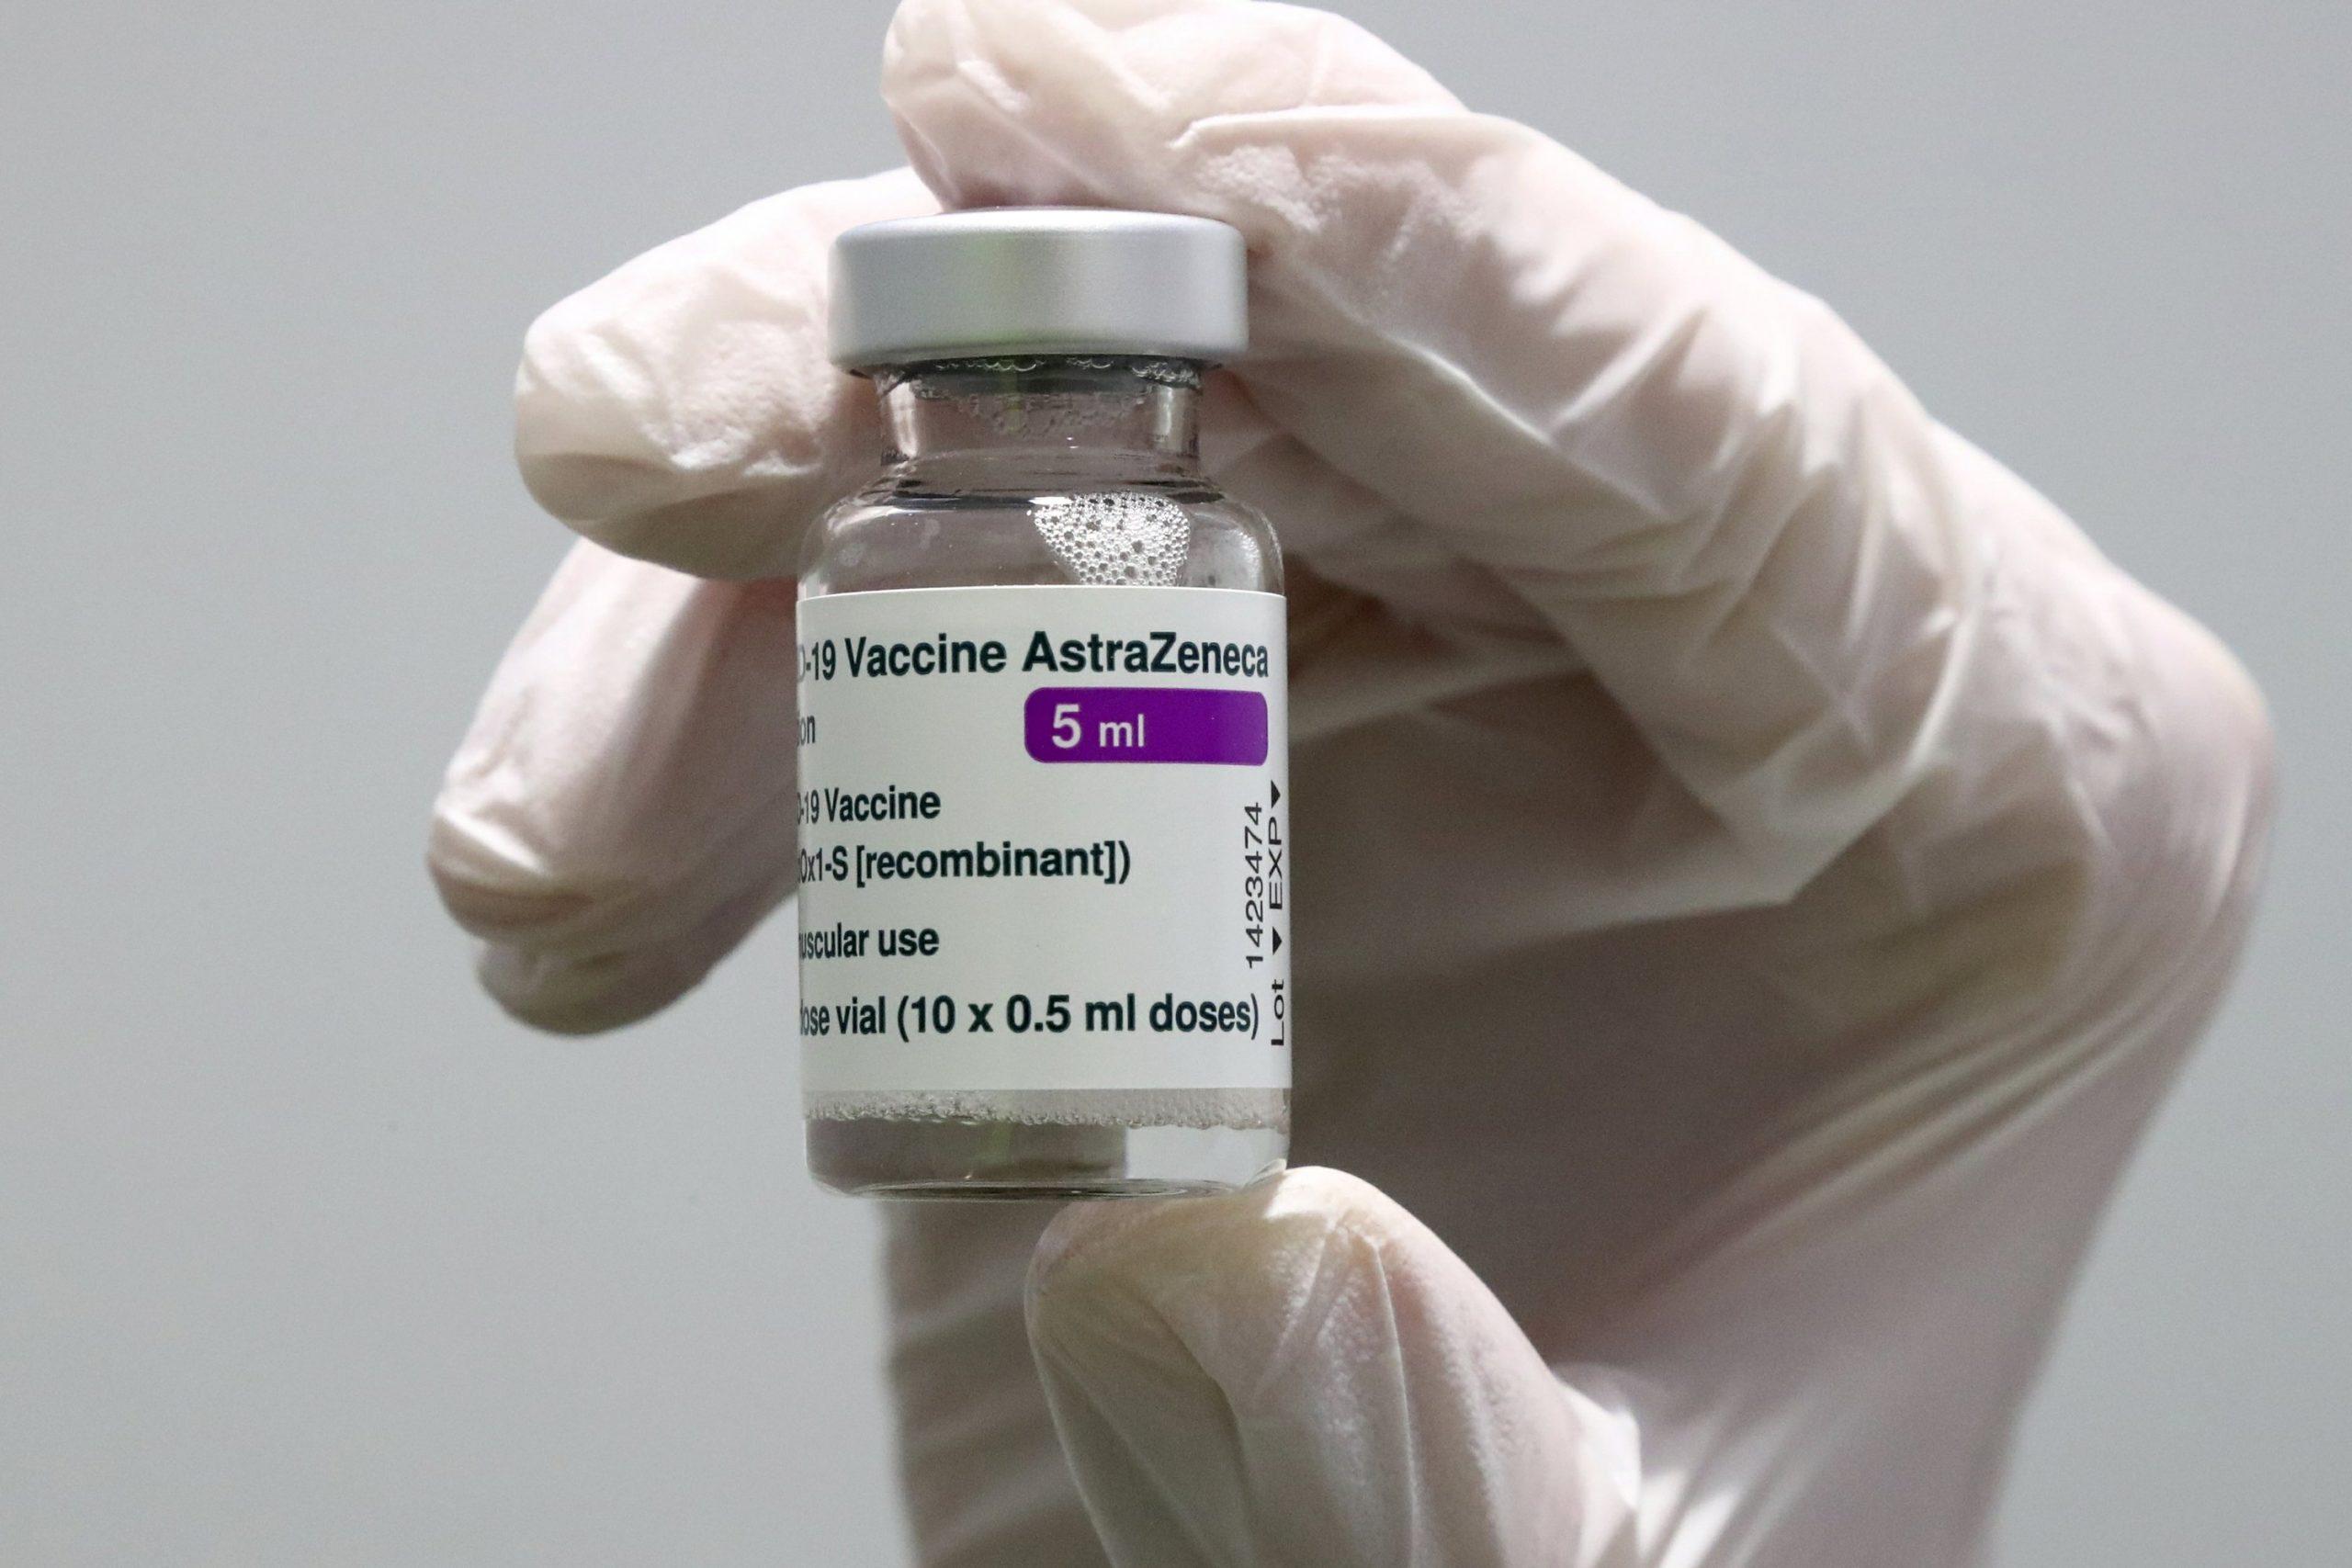 Qatar receives 48k doses of AstraZeneca COVID-19 vaccine